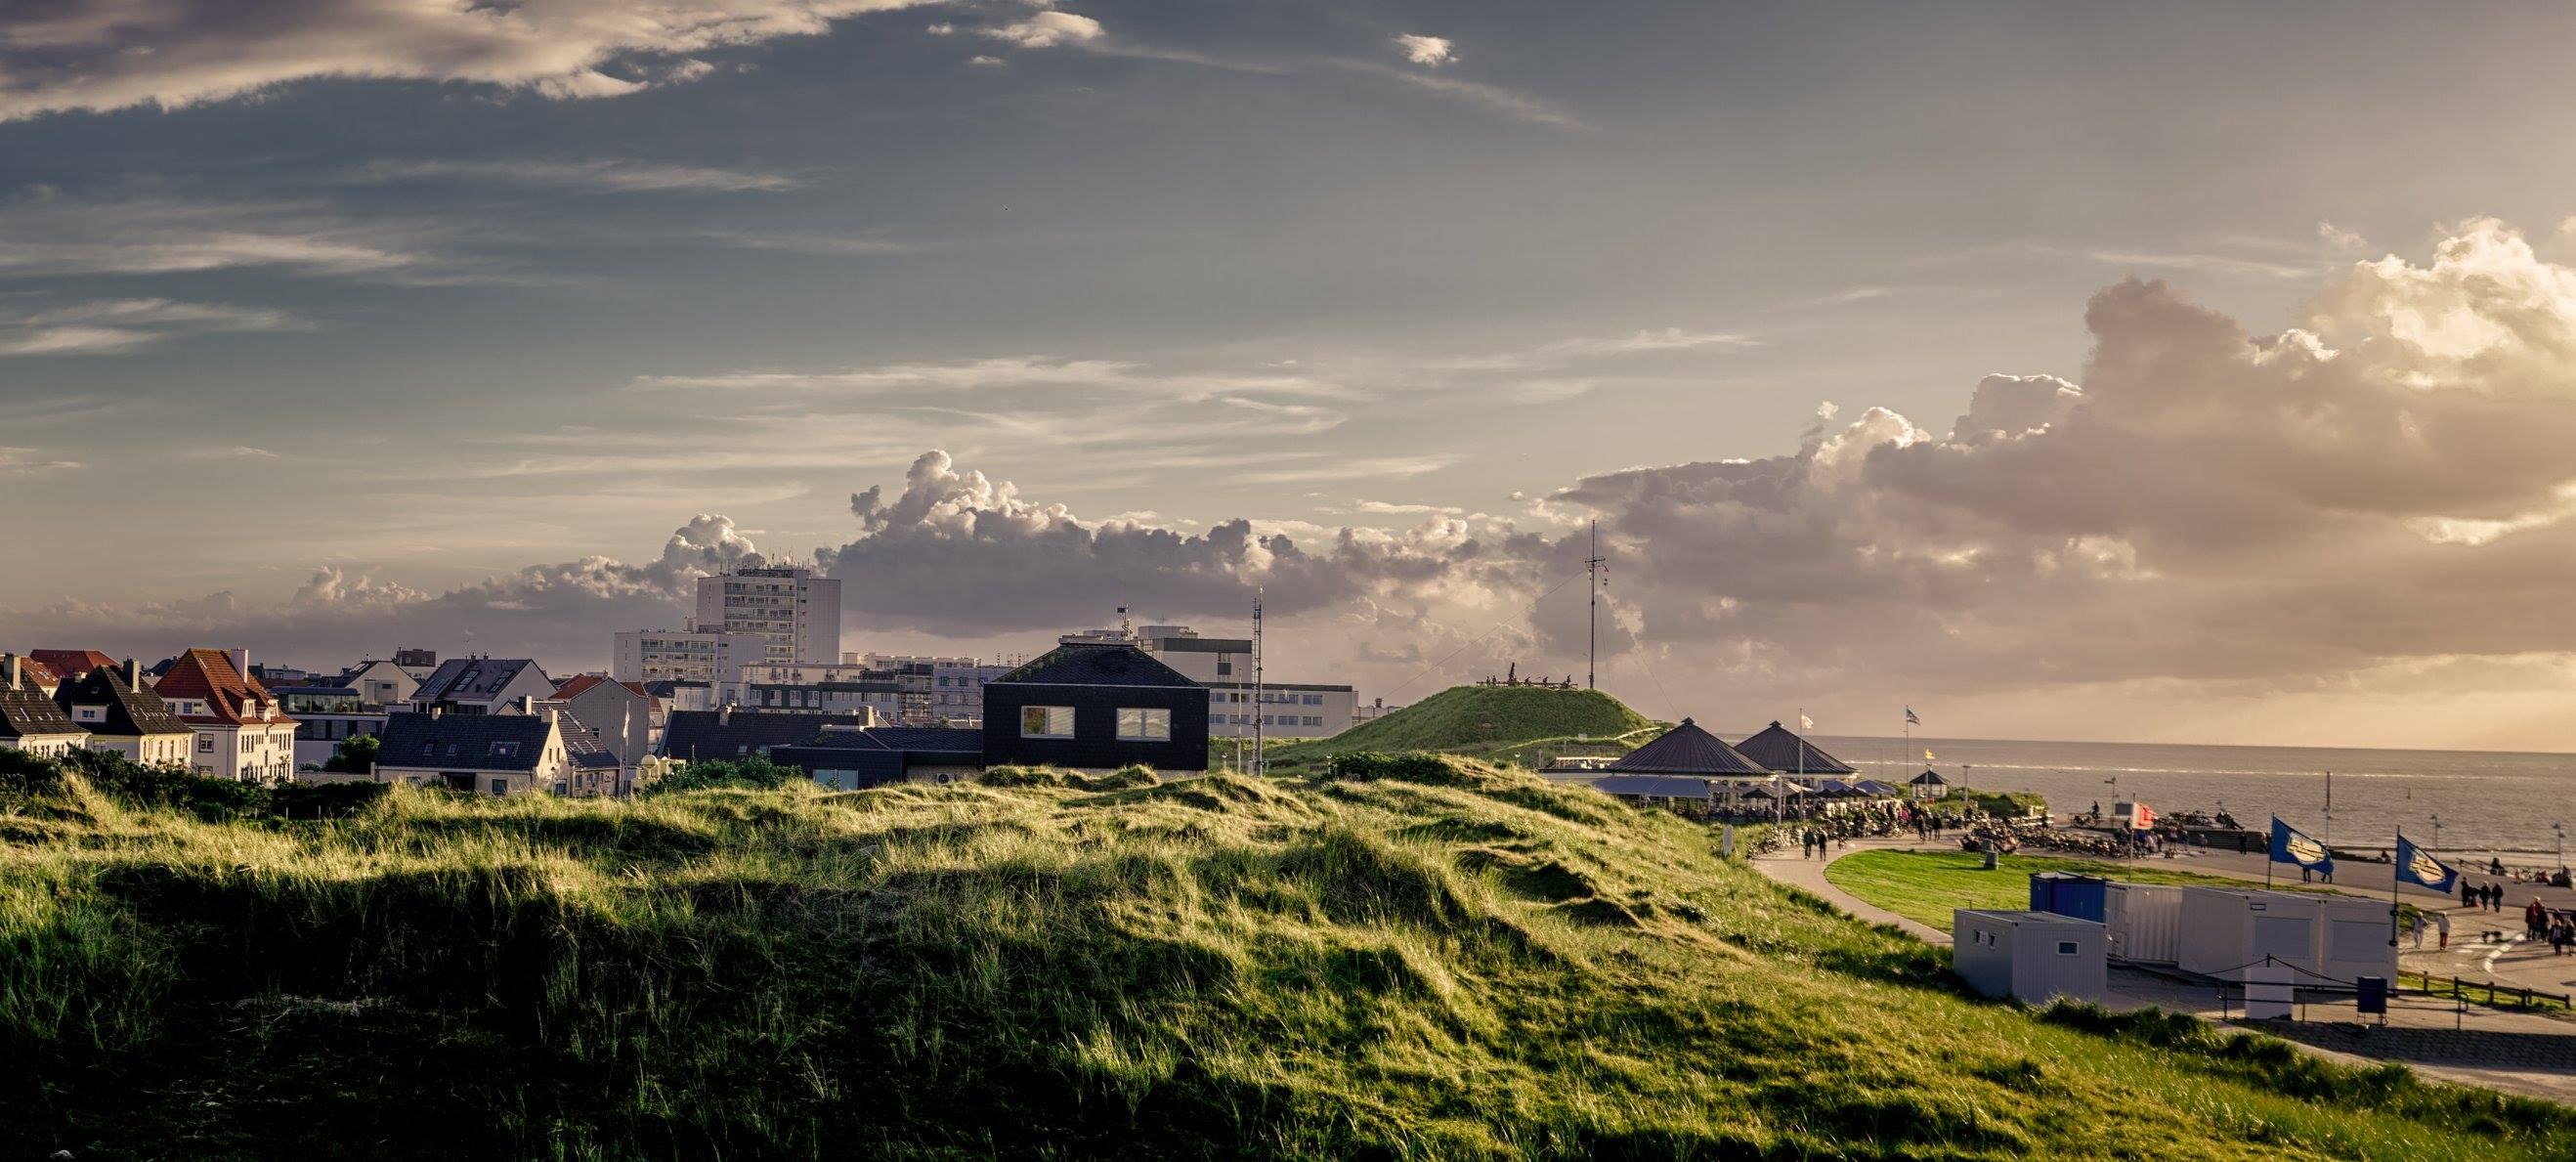 Wetter In Norderney